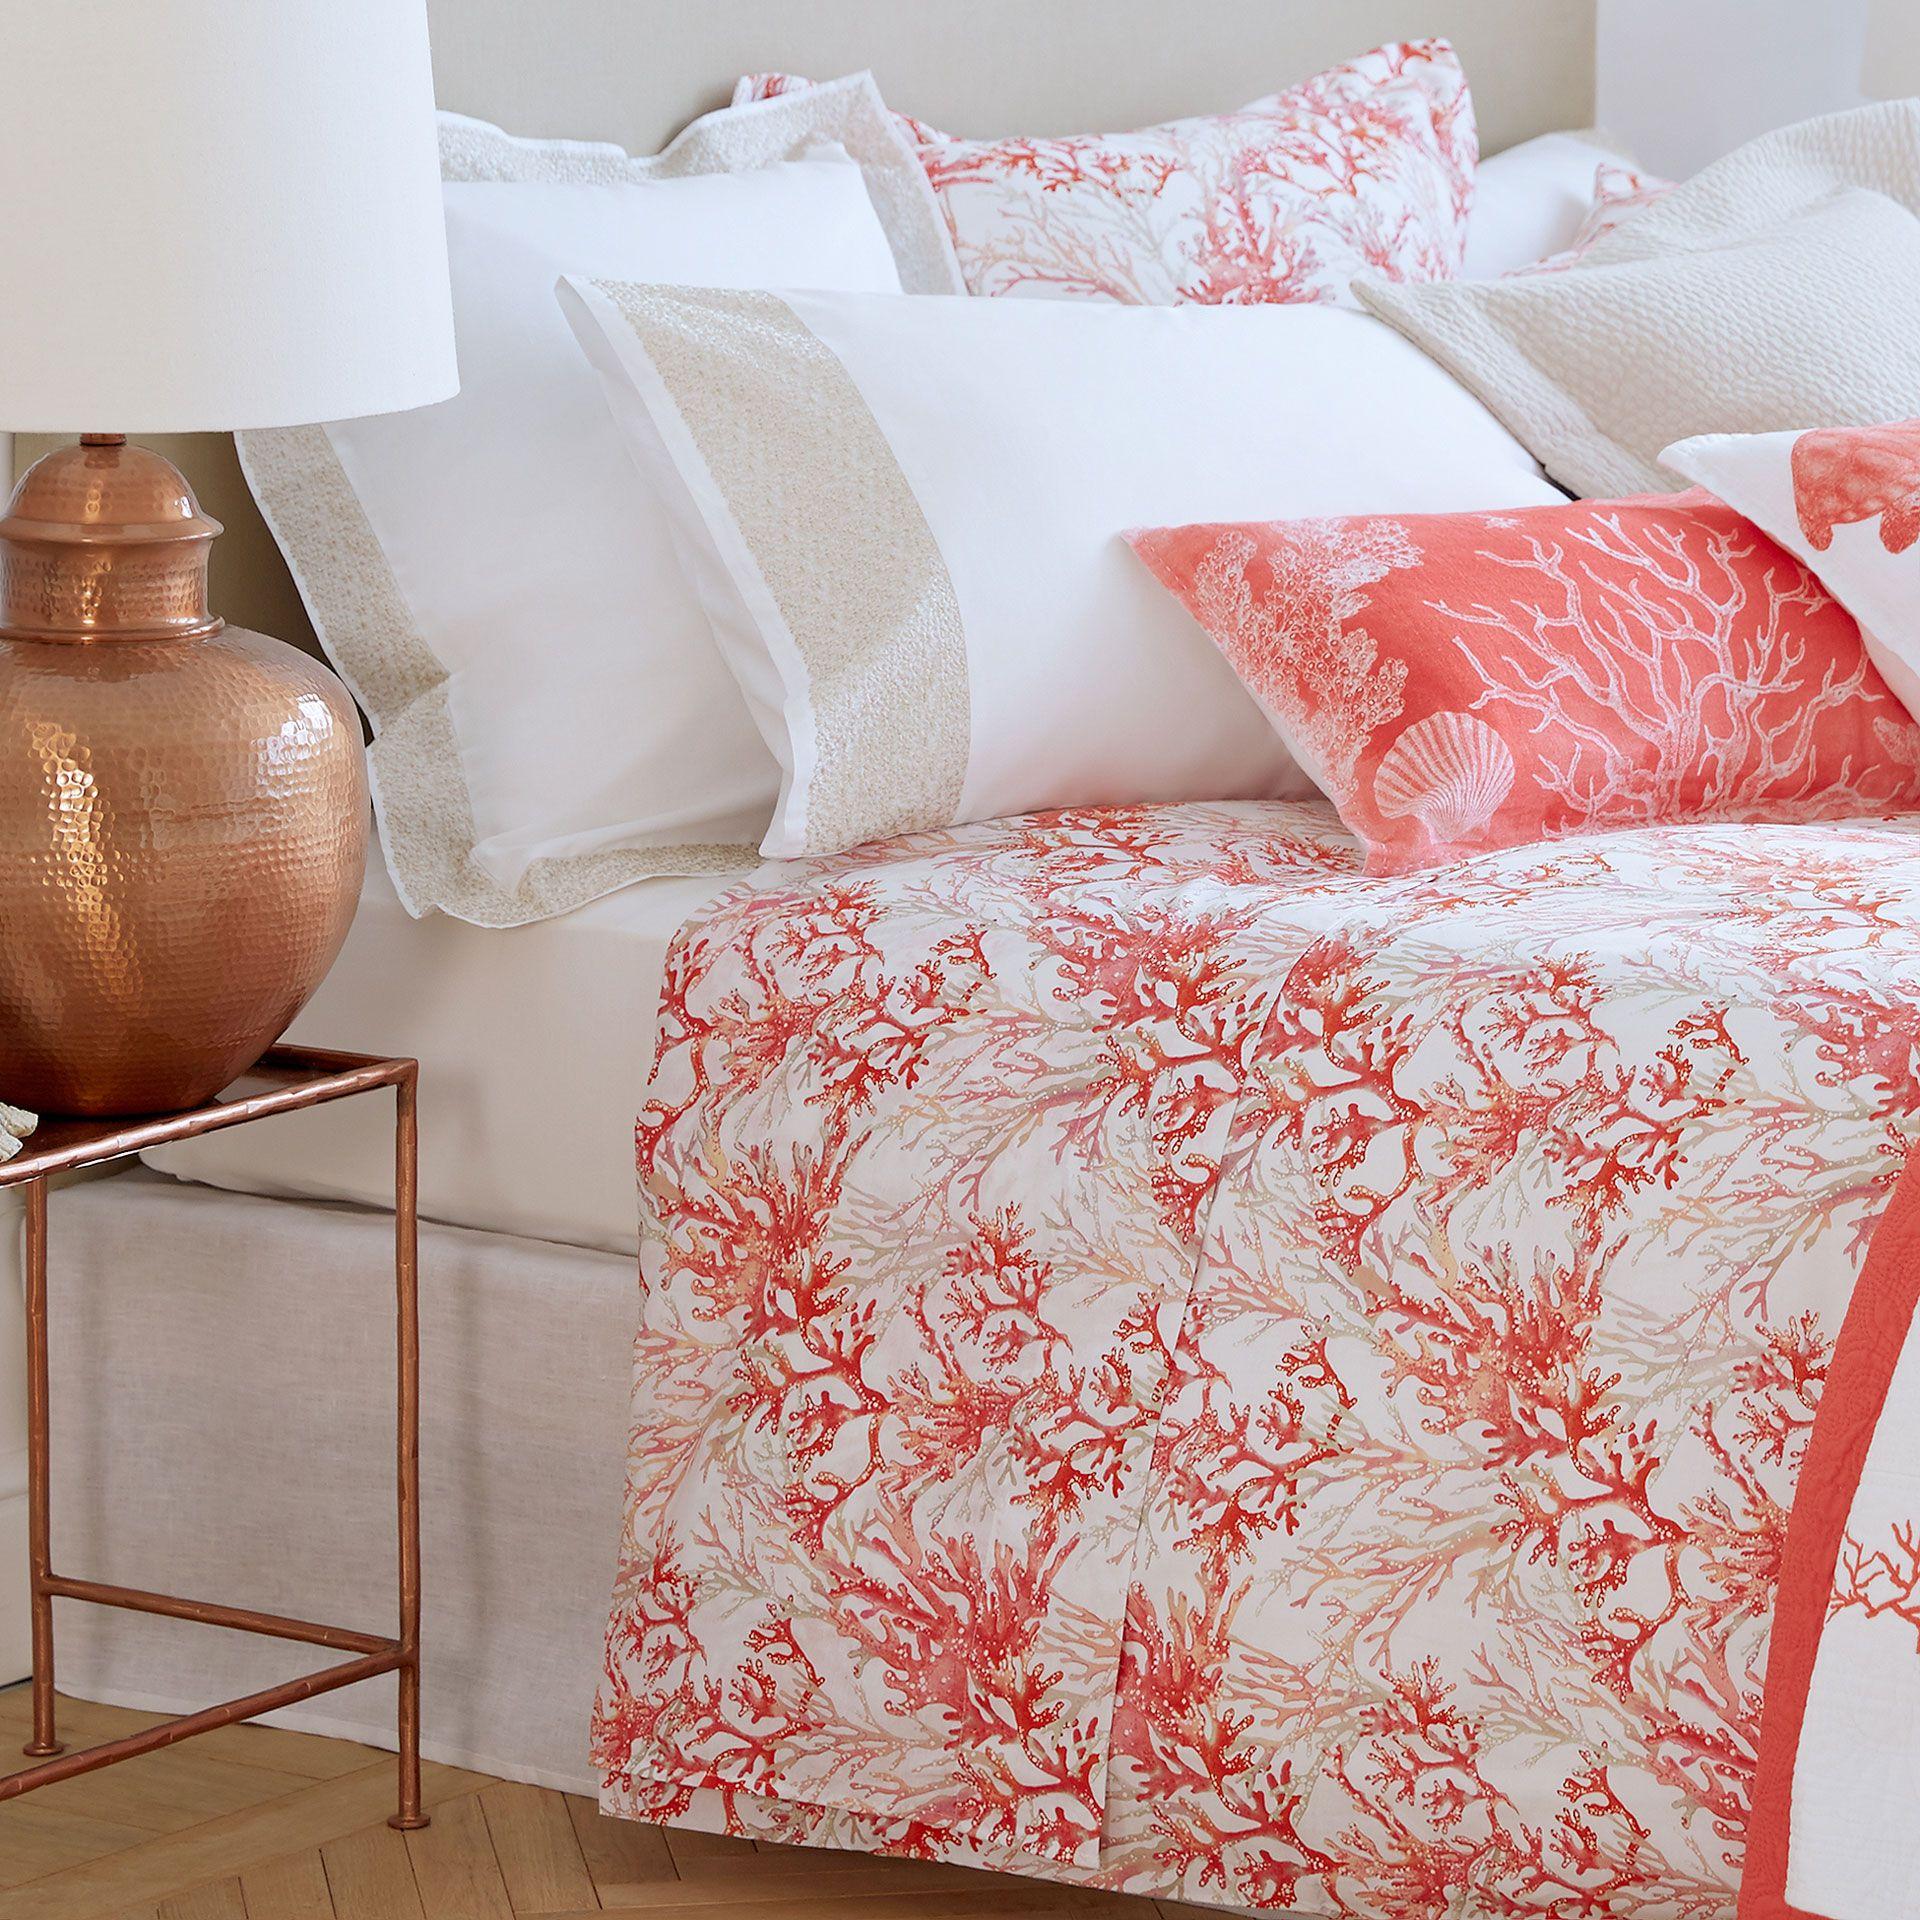 61ea4bb5ab4 Coral Print Bed Linen - Bed Linen - BEDROOM   Zara Home United Kingdom